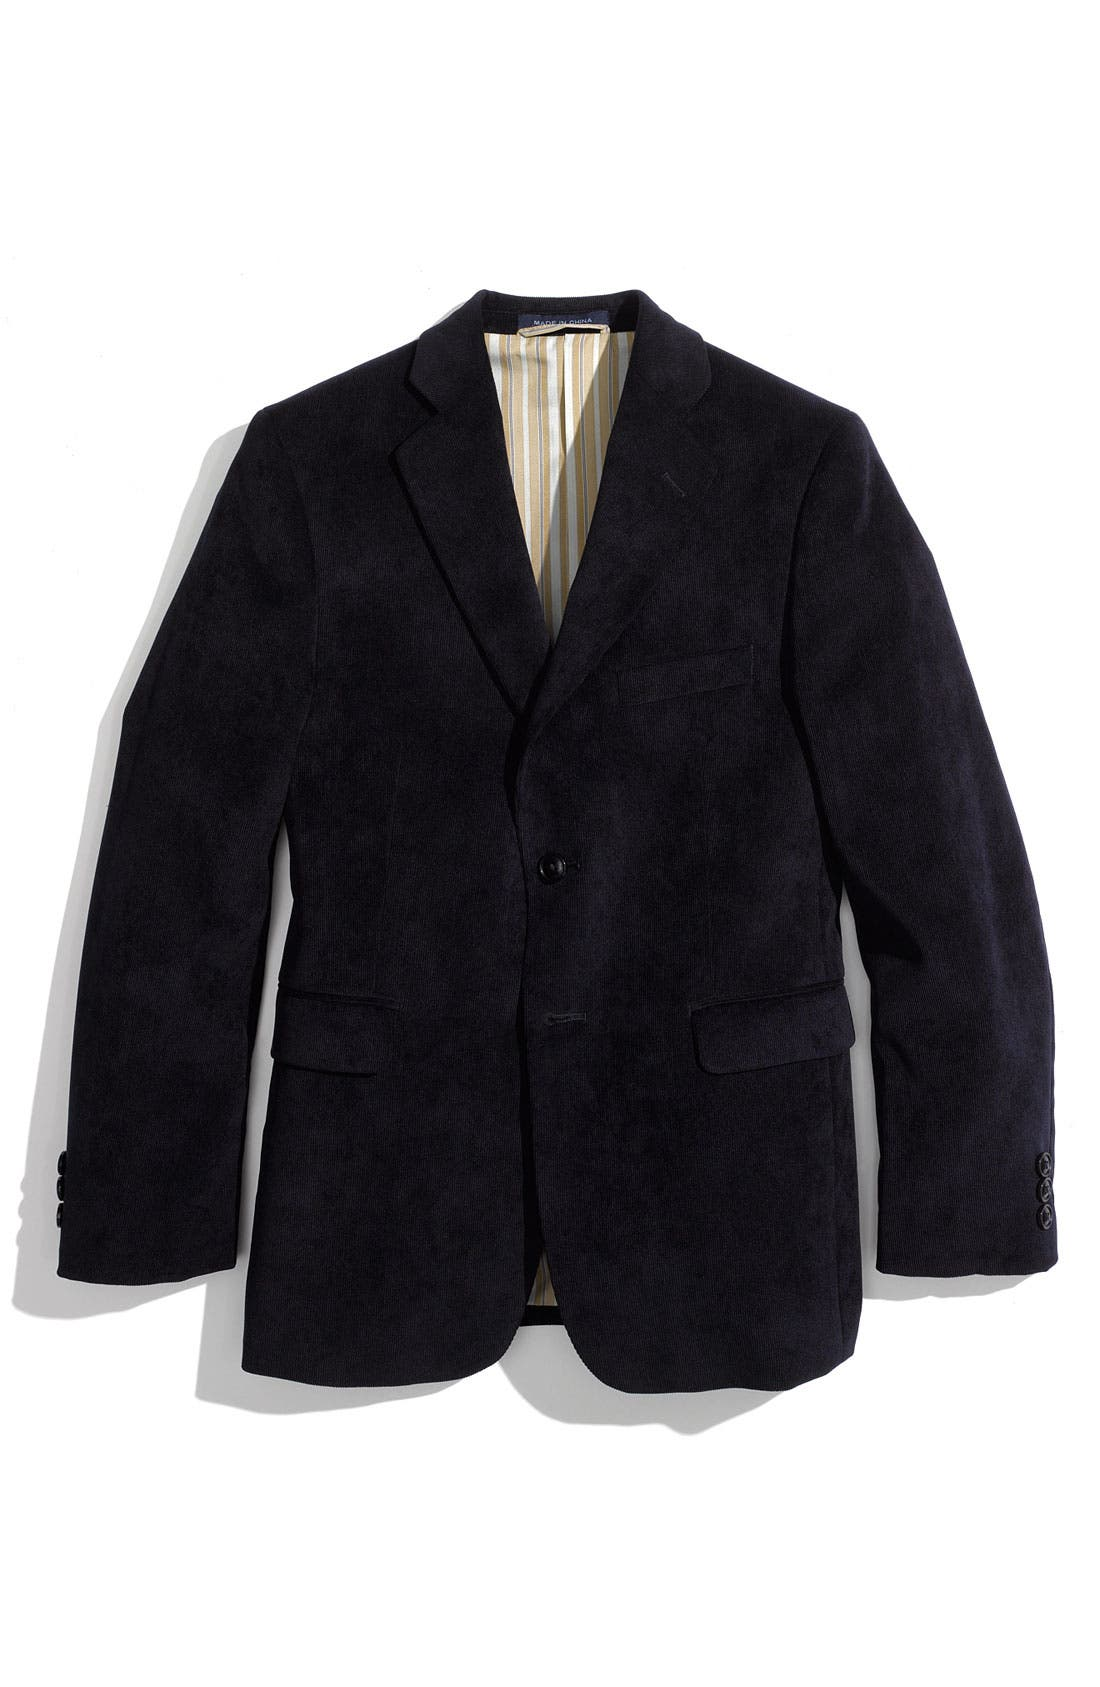 Main Image - Joseph Abboud Corduroy Sportcoat (Big Boys)